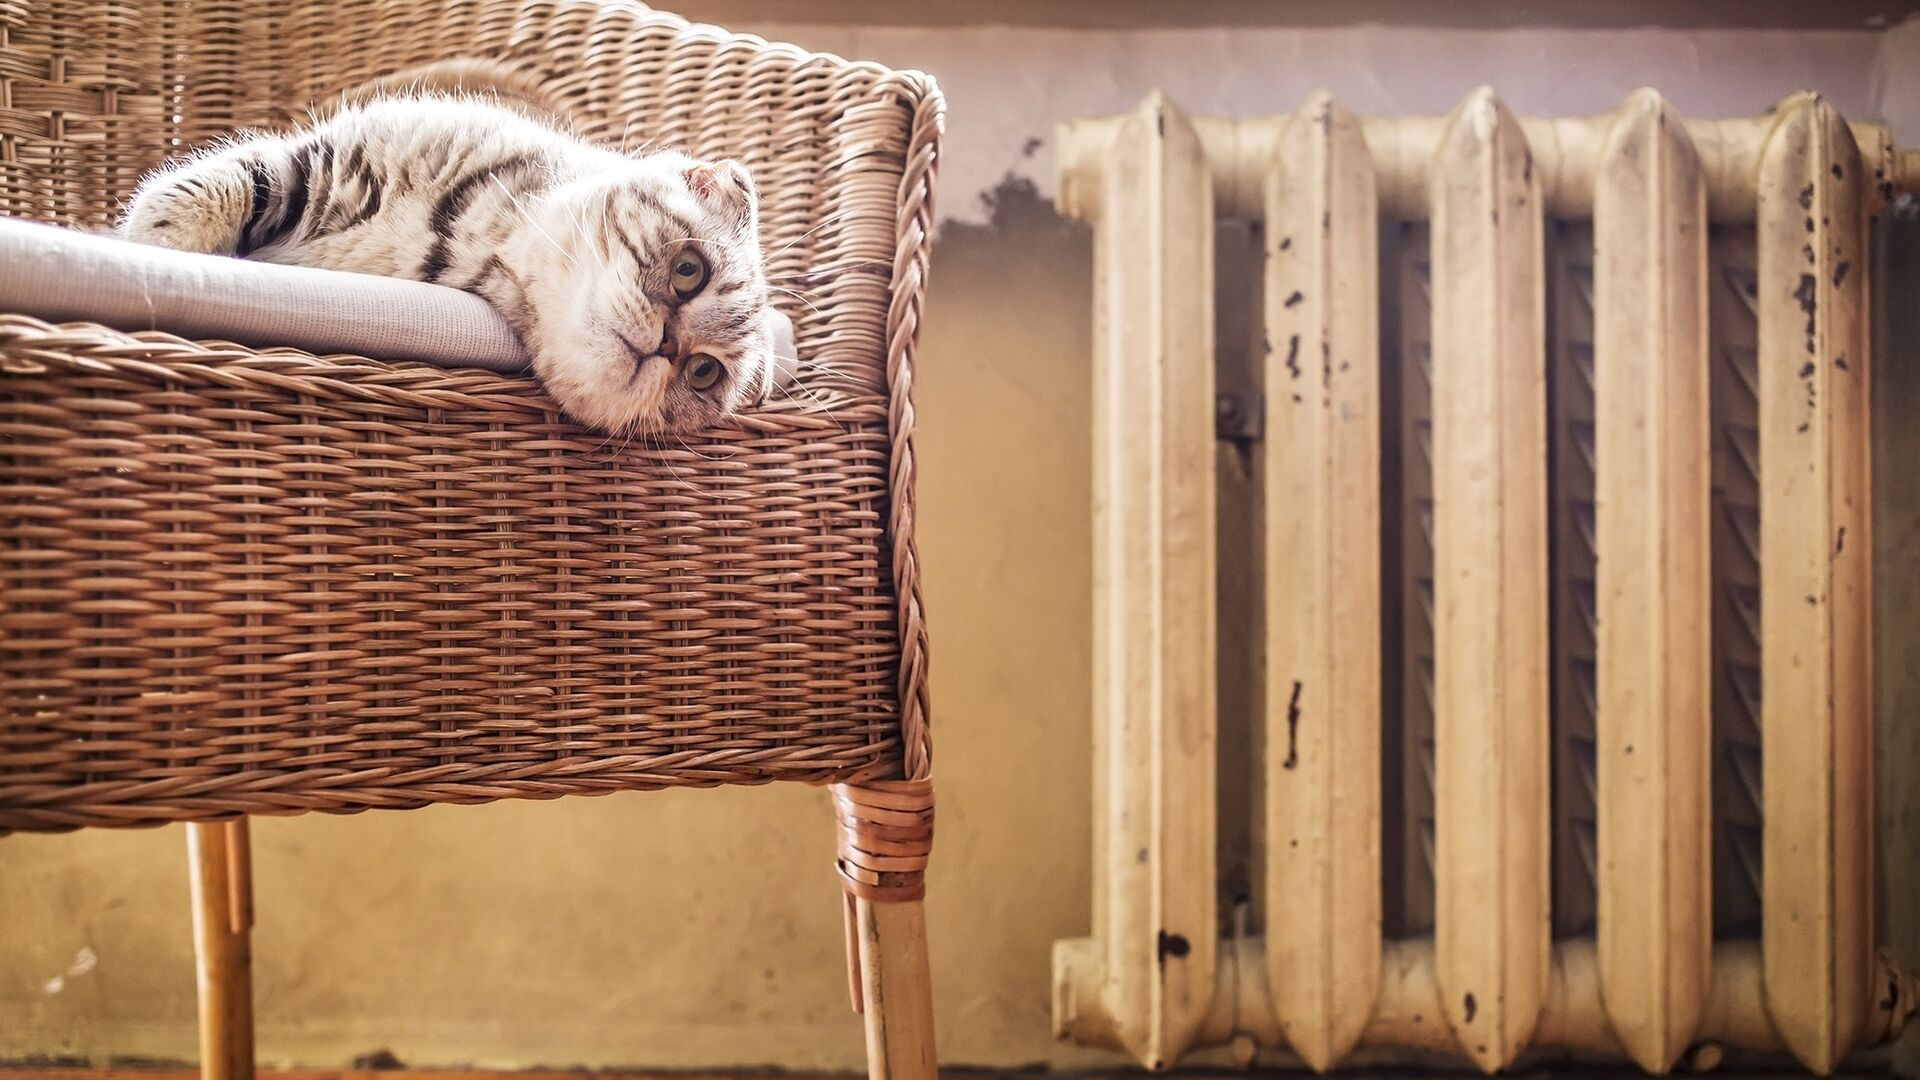 Кот в кресле у батареи - РИА Новости, 1920, 22.09.2020